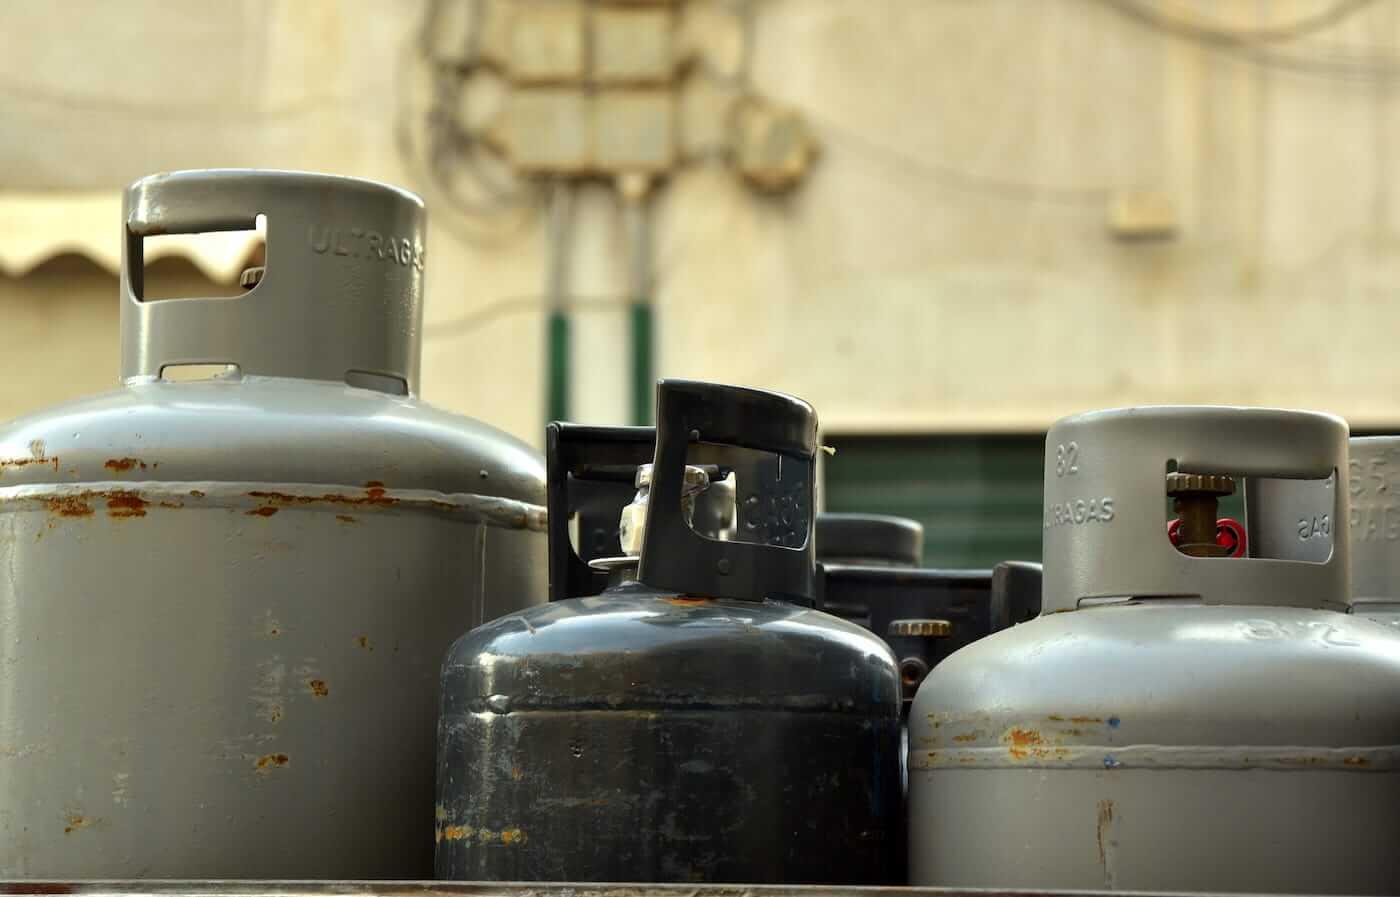 bbq gas bottles